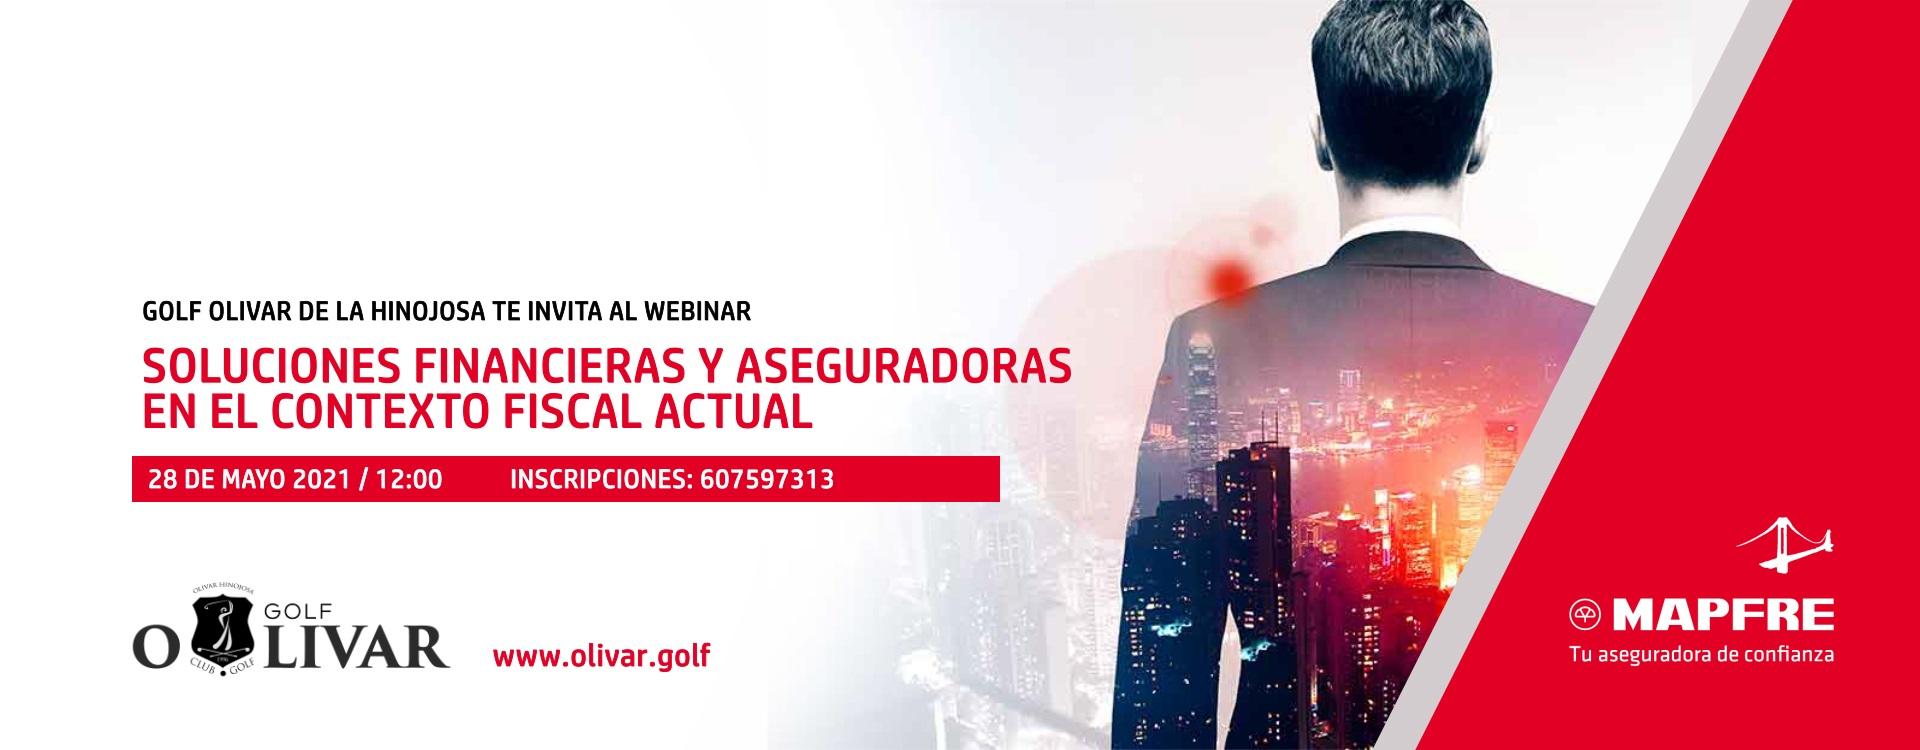 Joaquin Molpeceres Olivar de la Hinojosa Webinar Mapfre seguros